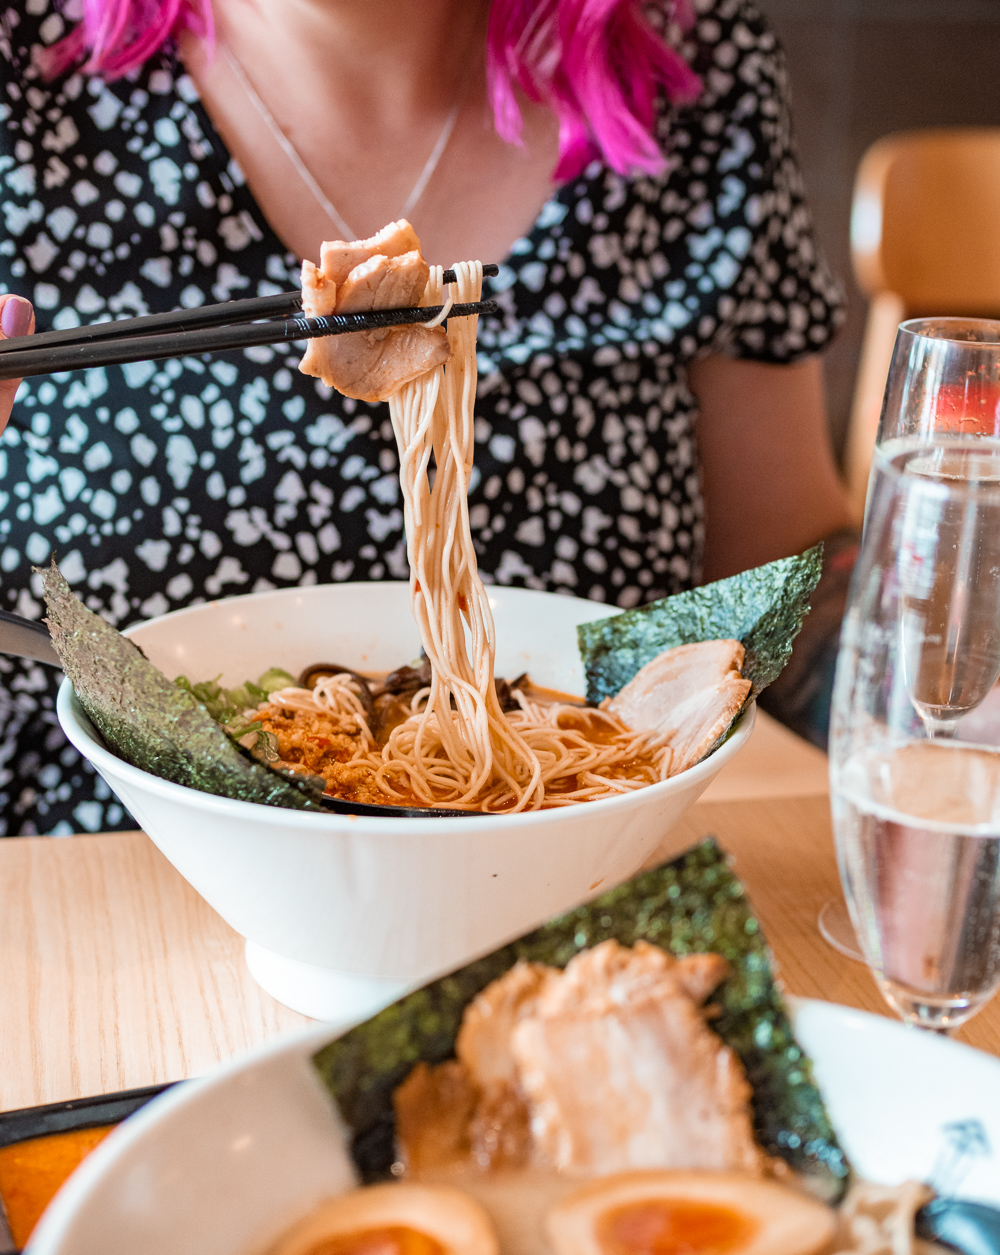 Kanada-ya ramen noodles